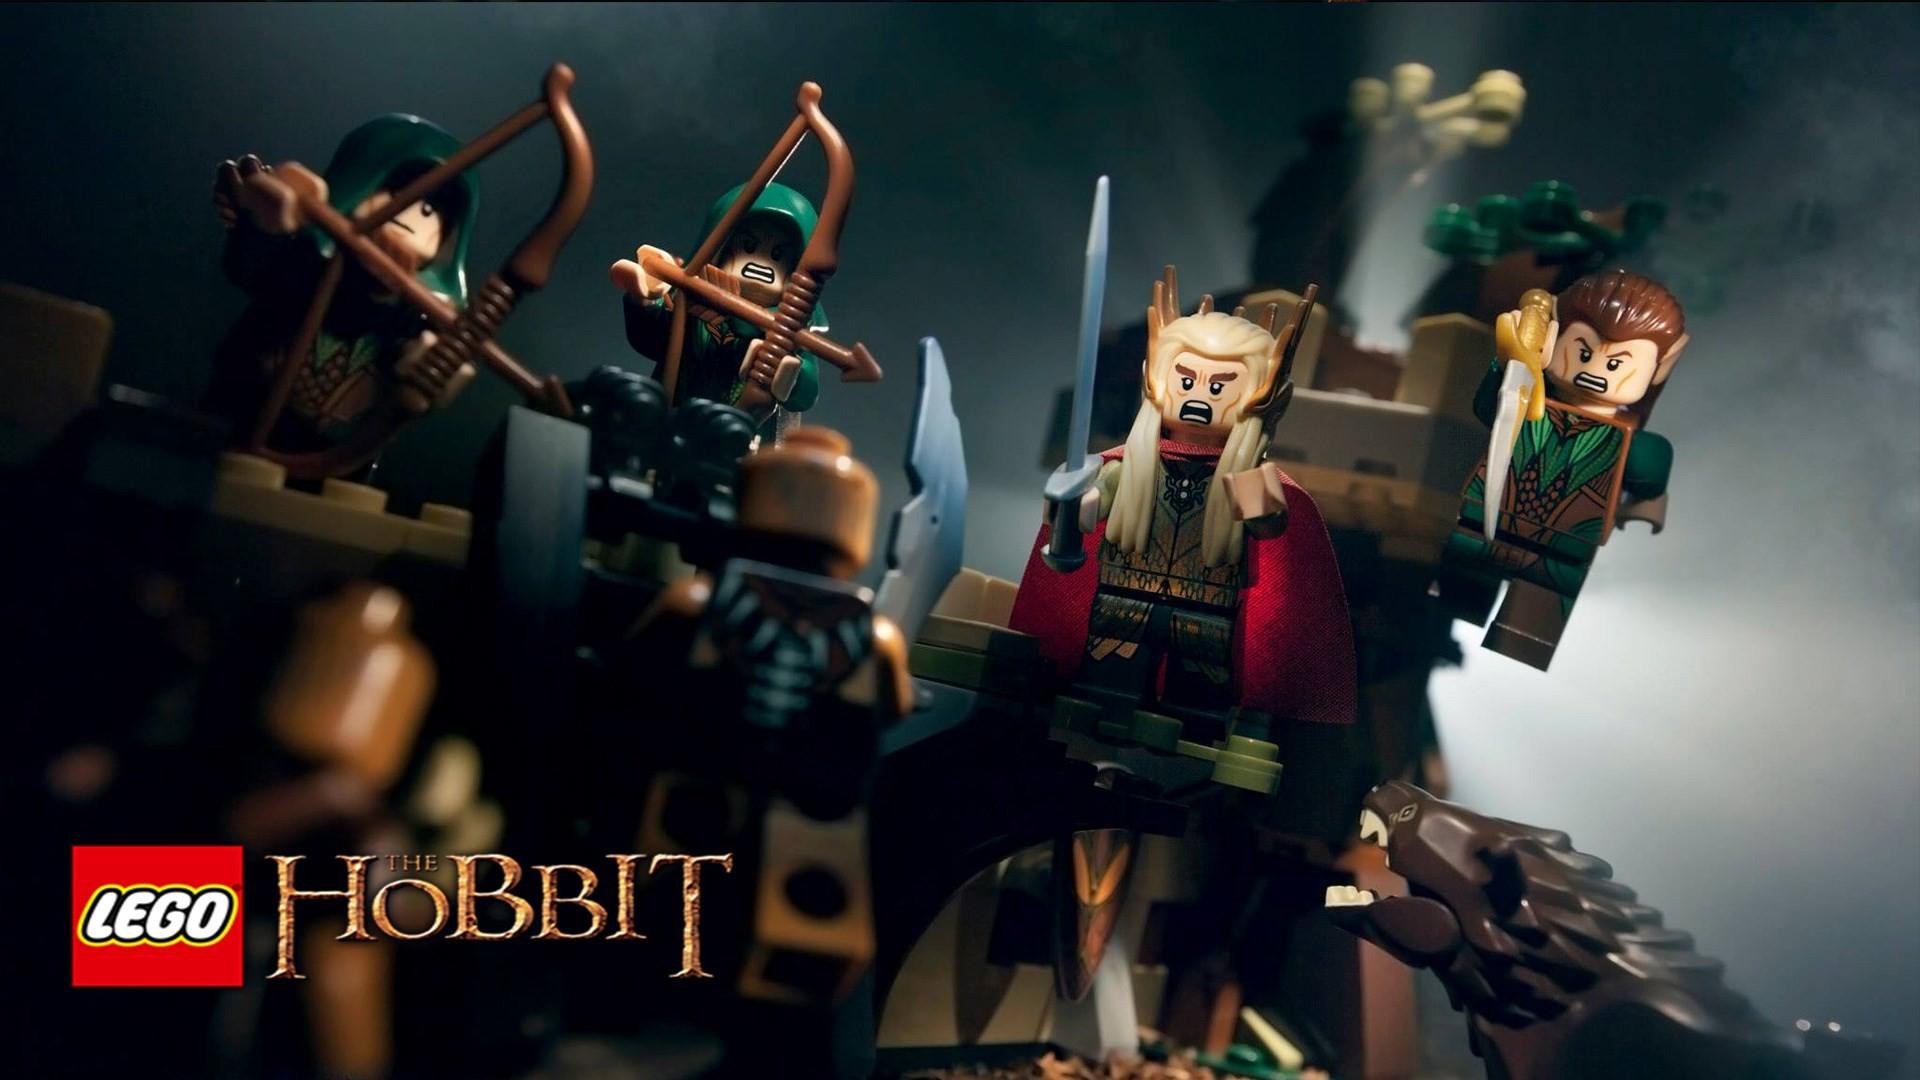 lego the hobbit backgrounds for laptop (Rodney Ross 1920×1080)